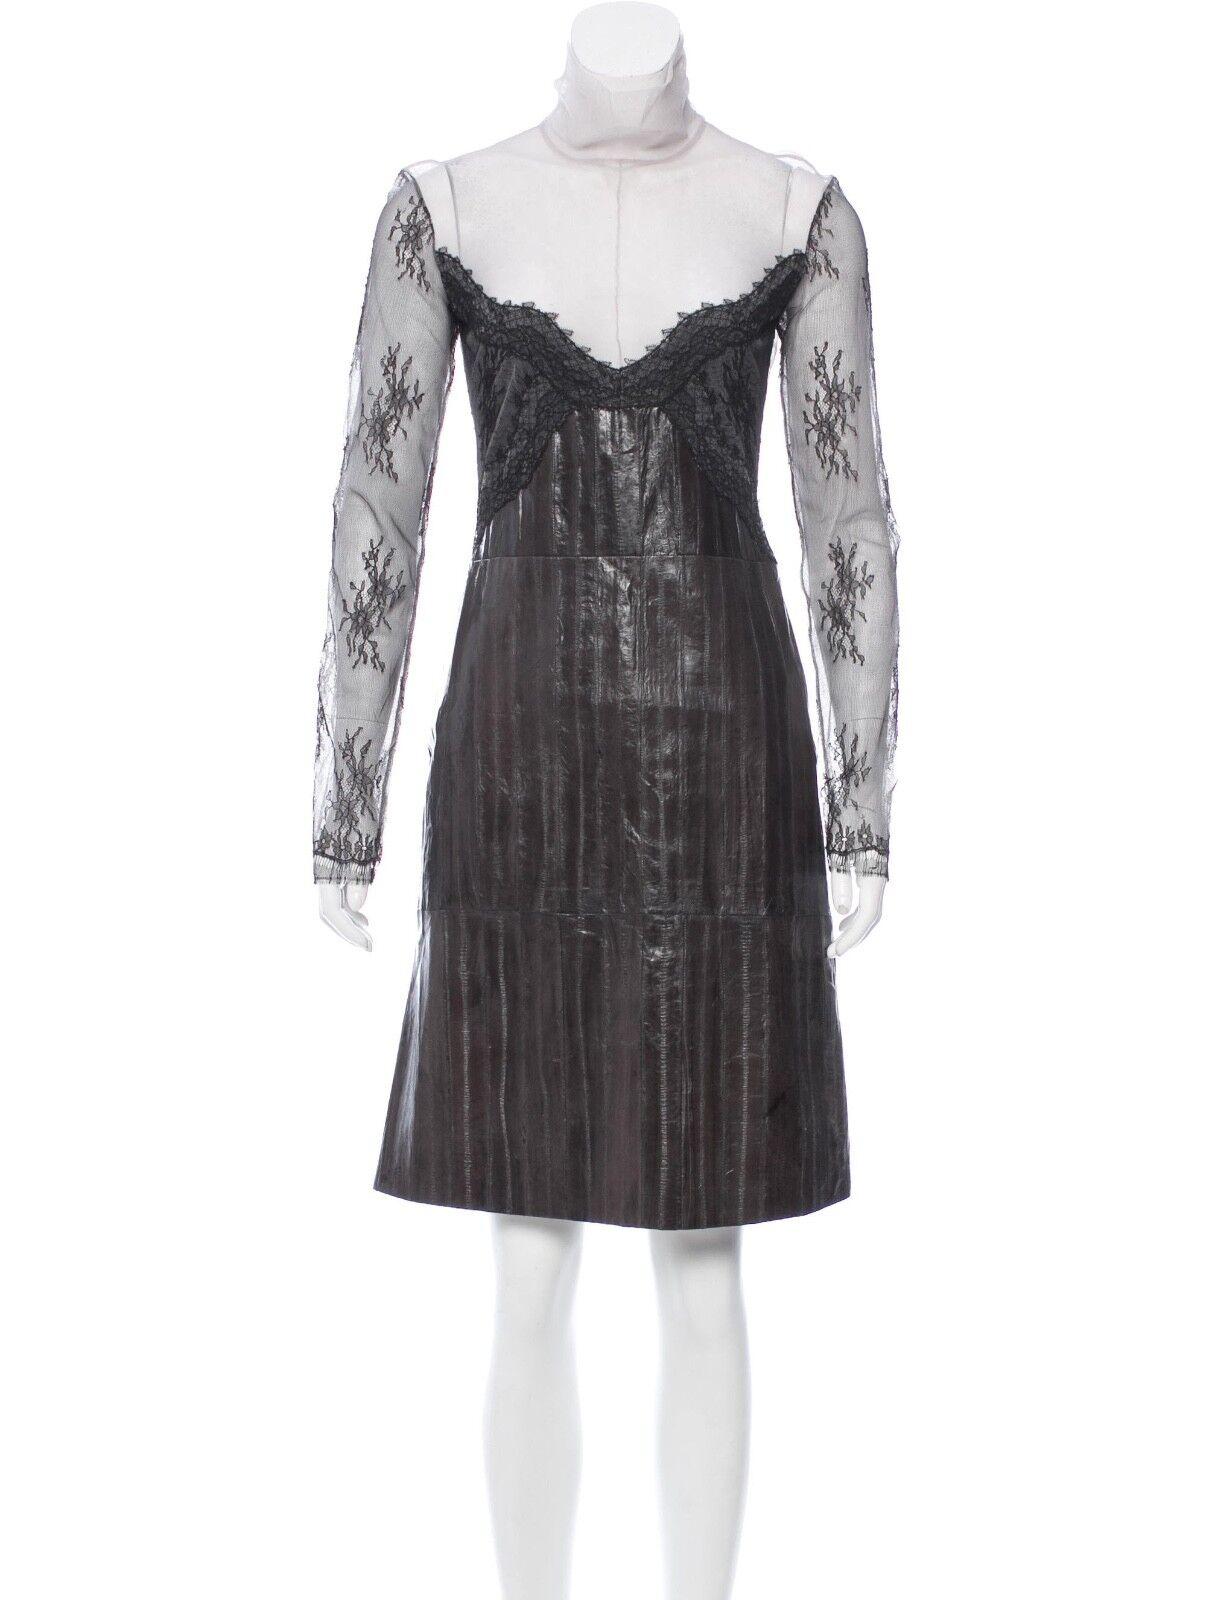 New Designer Nina Ricci Fabulous Front Lace Eel Skin Skirt Dress France  2290,42